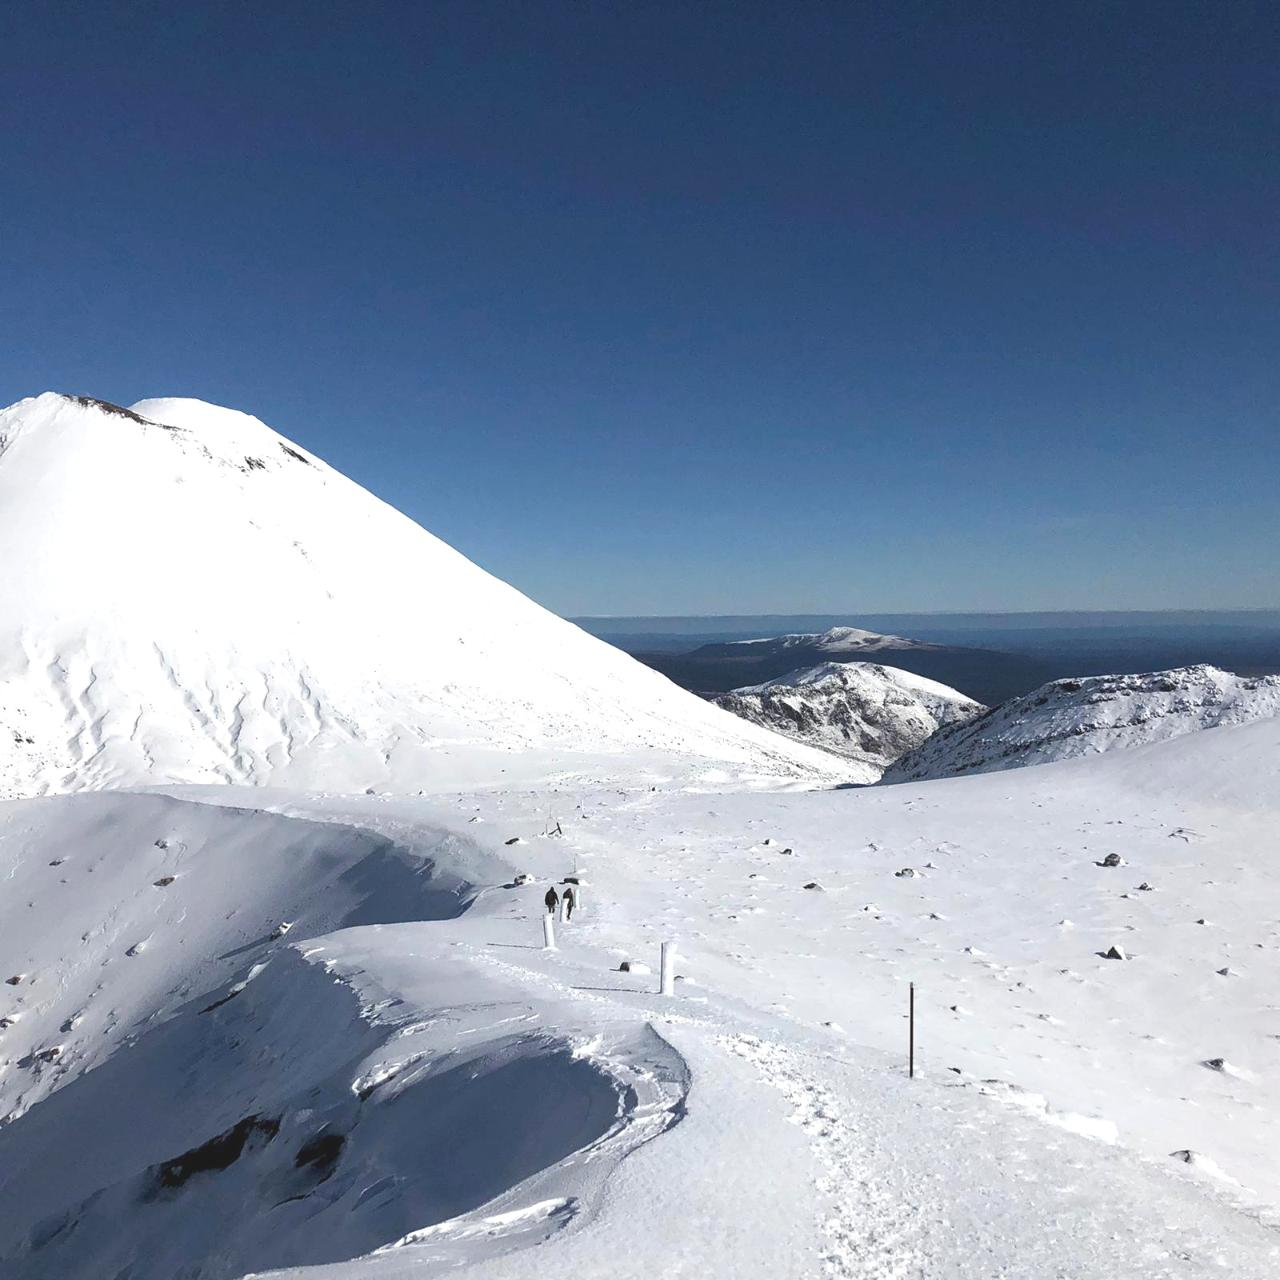 Tongariro Alpine Crossing Guided Walk - WINTER SPECIAL